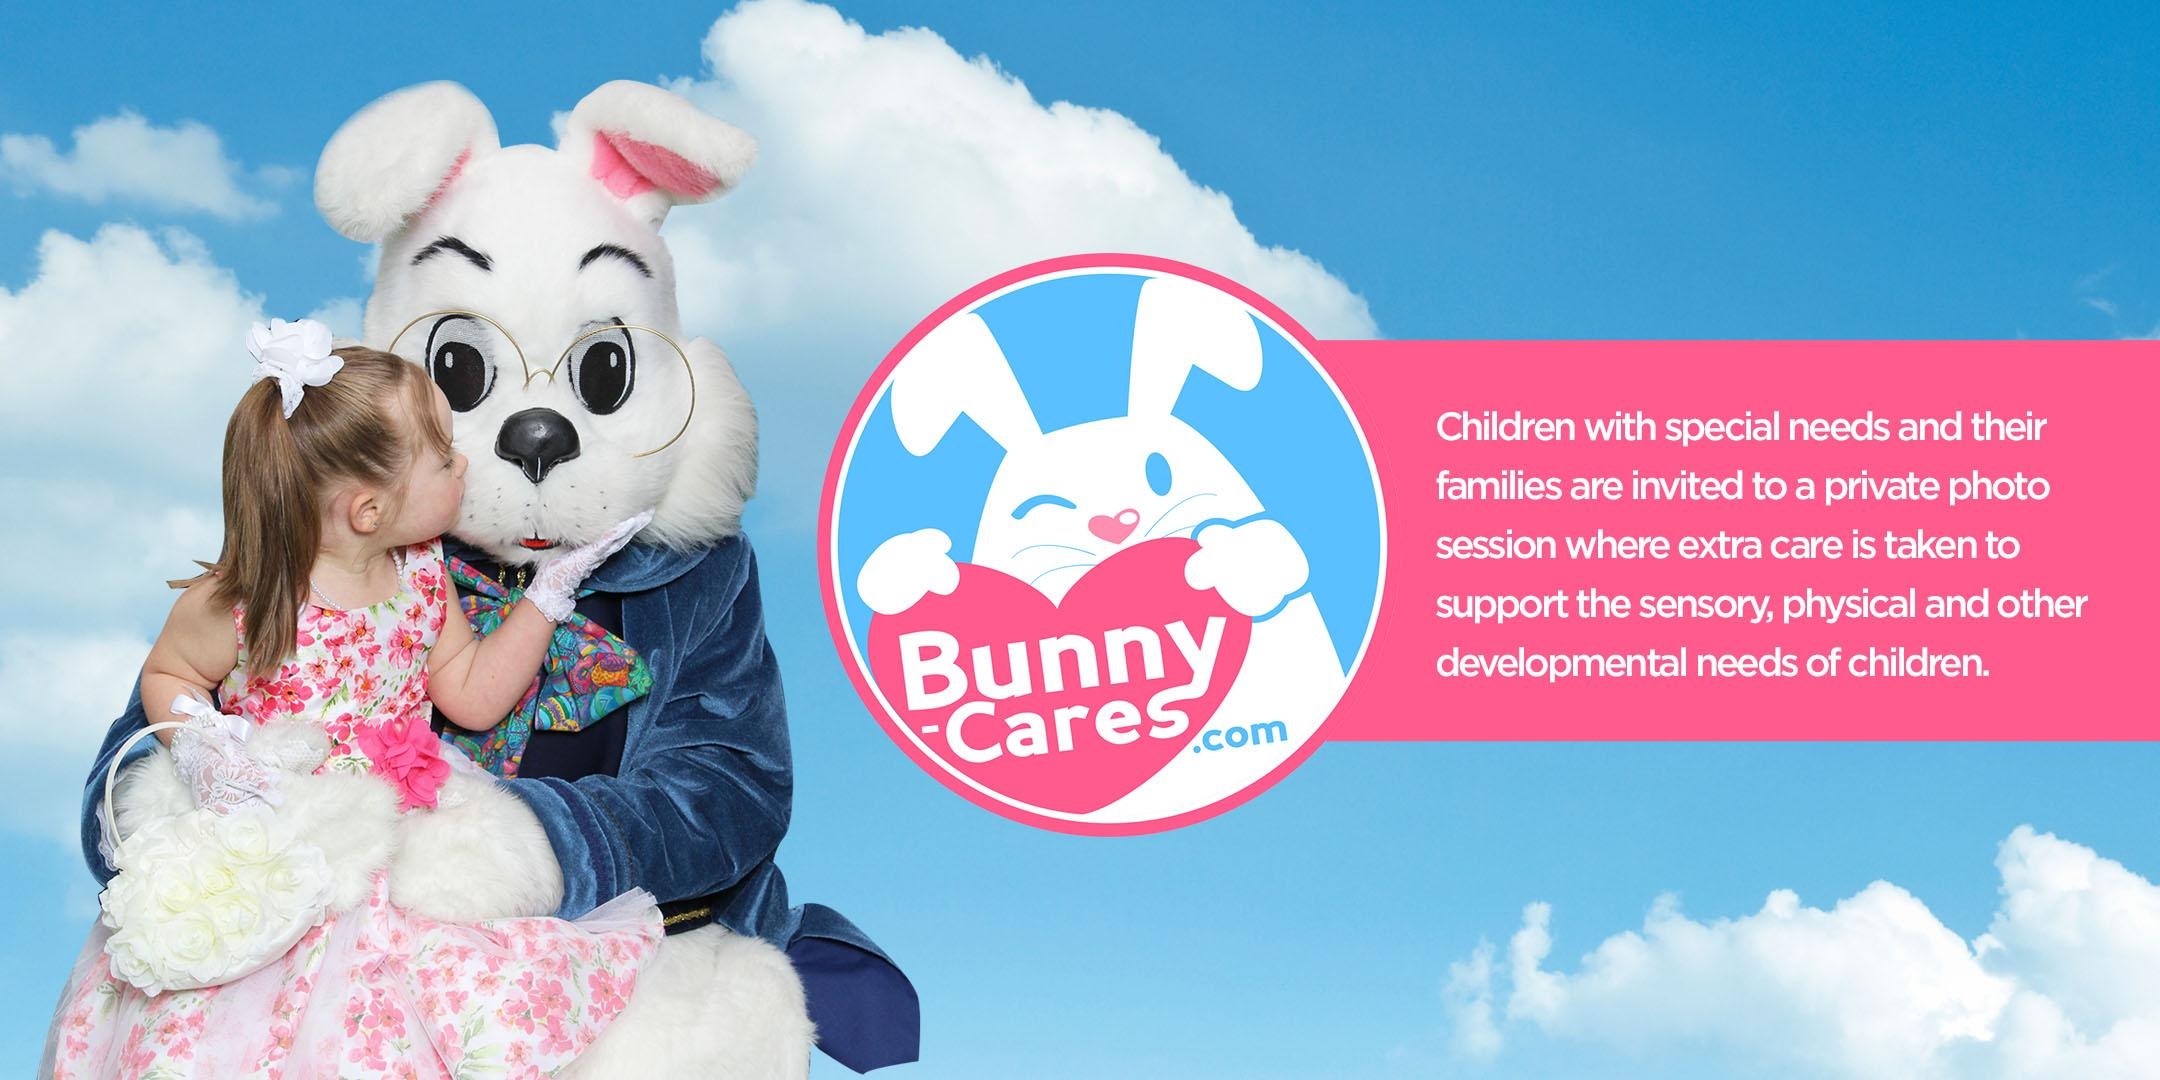 The Mall at Greece Ridge - Bunny Cares